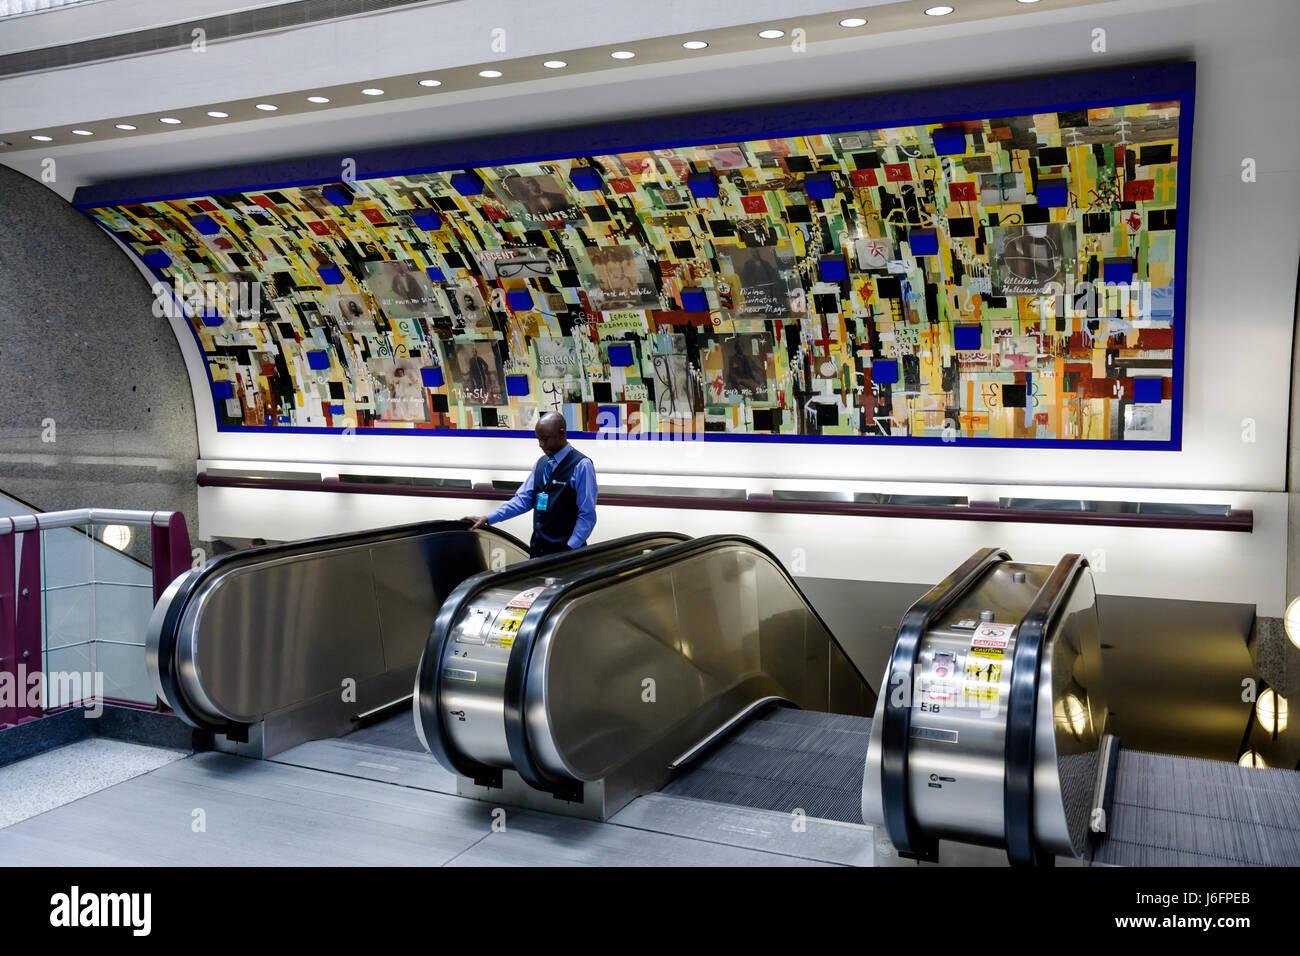 Atlanta Georgia Hartsfield-Jackson Atlanta International Airport escalator up down mural public art Black man Saints - Stock Image